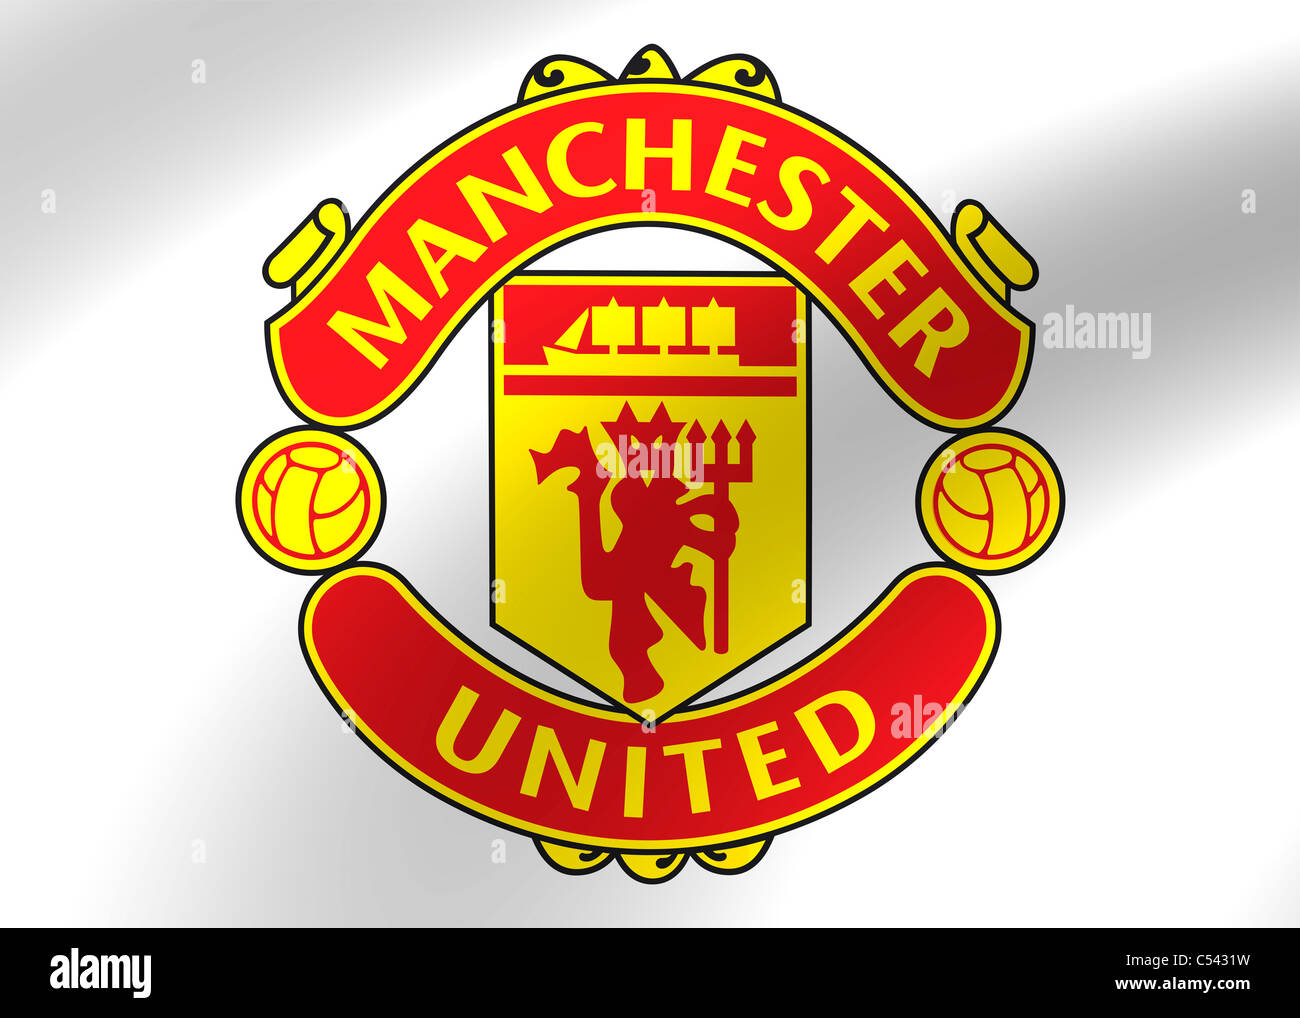 Manchester united flag logo symbol icon stock photo 37584229 alamy manchester united flag logo symbol icon voltagebd Images